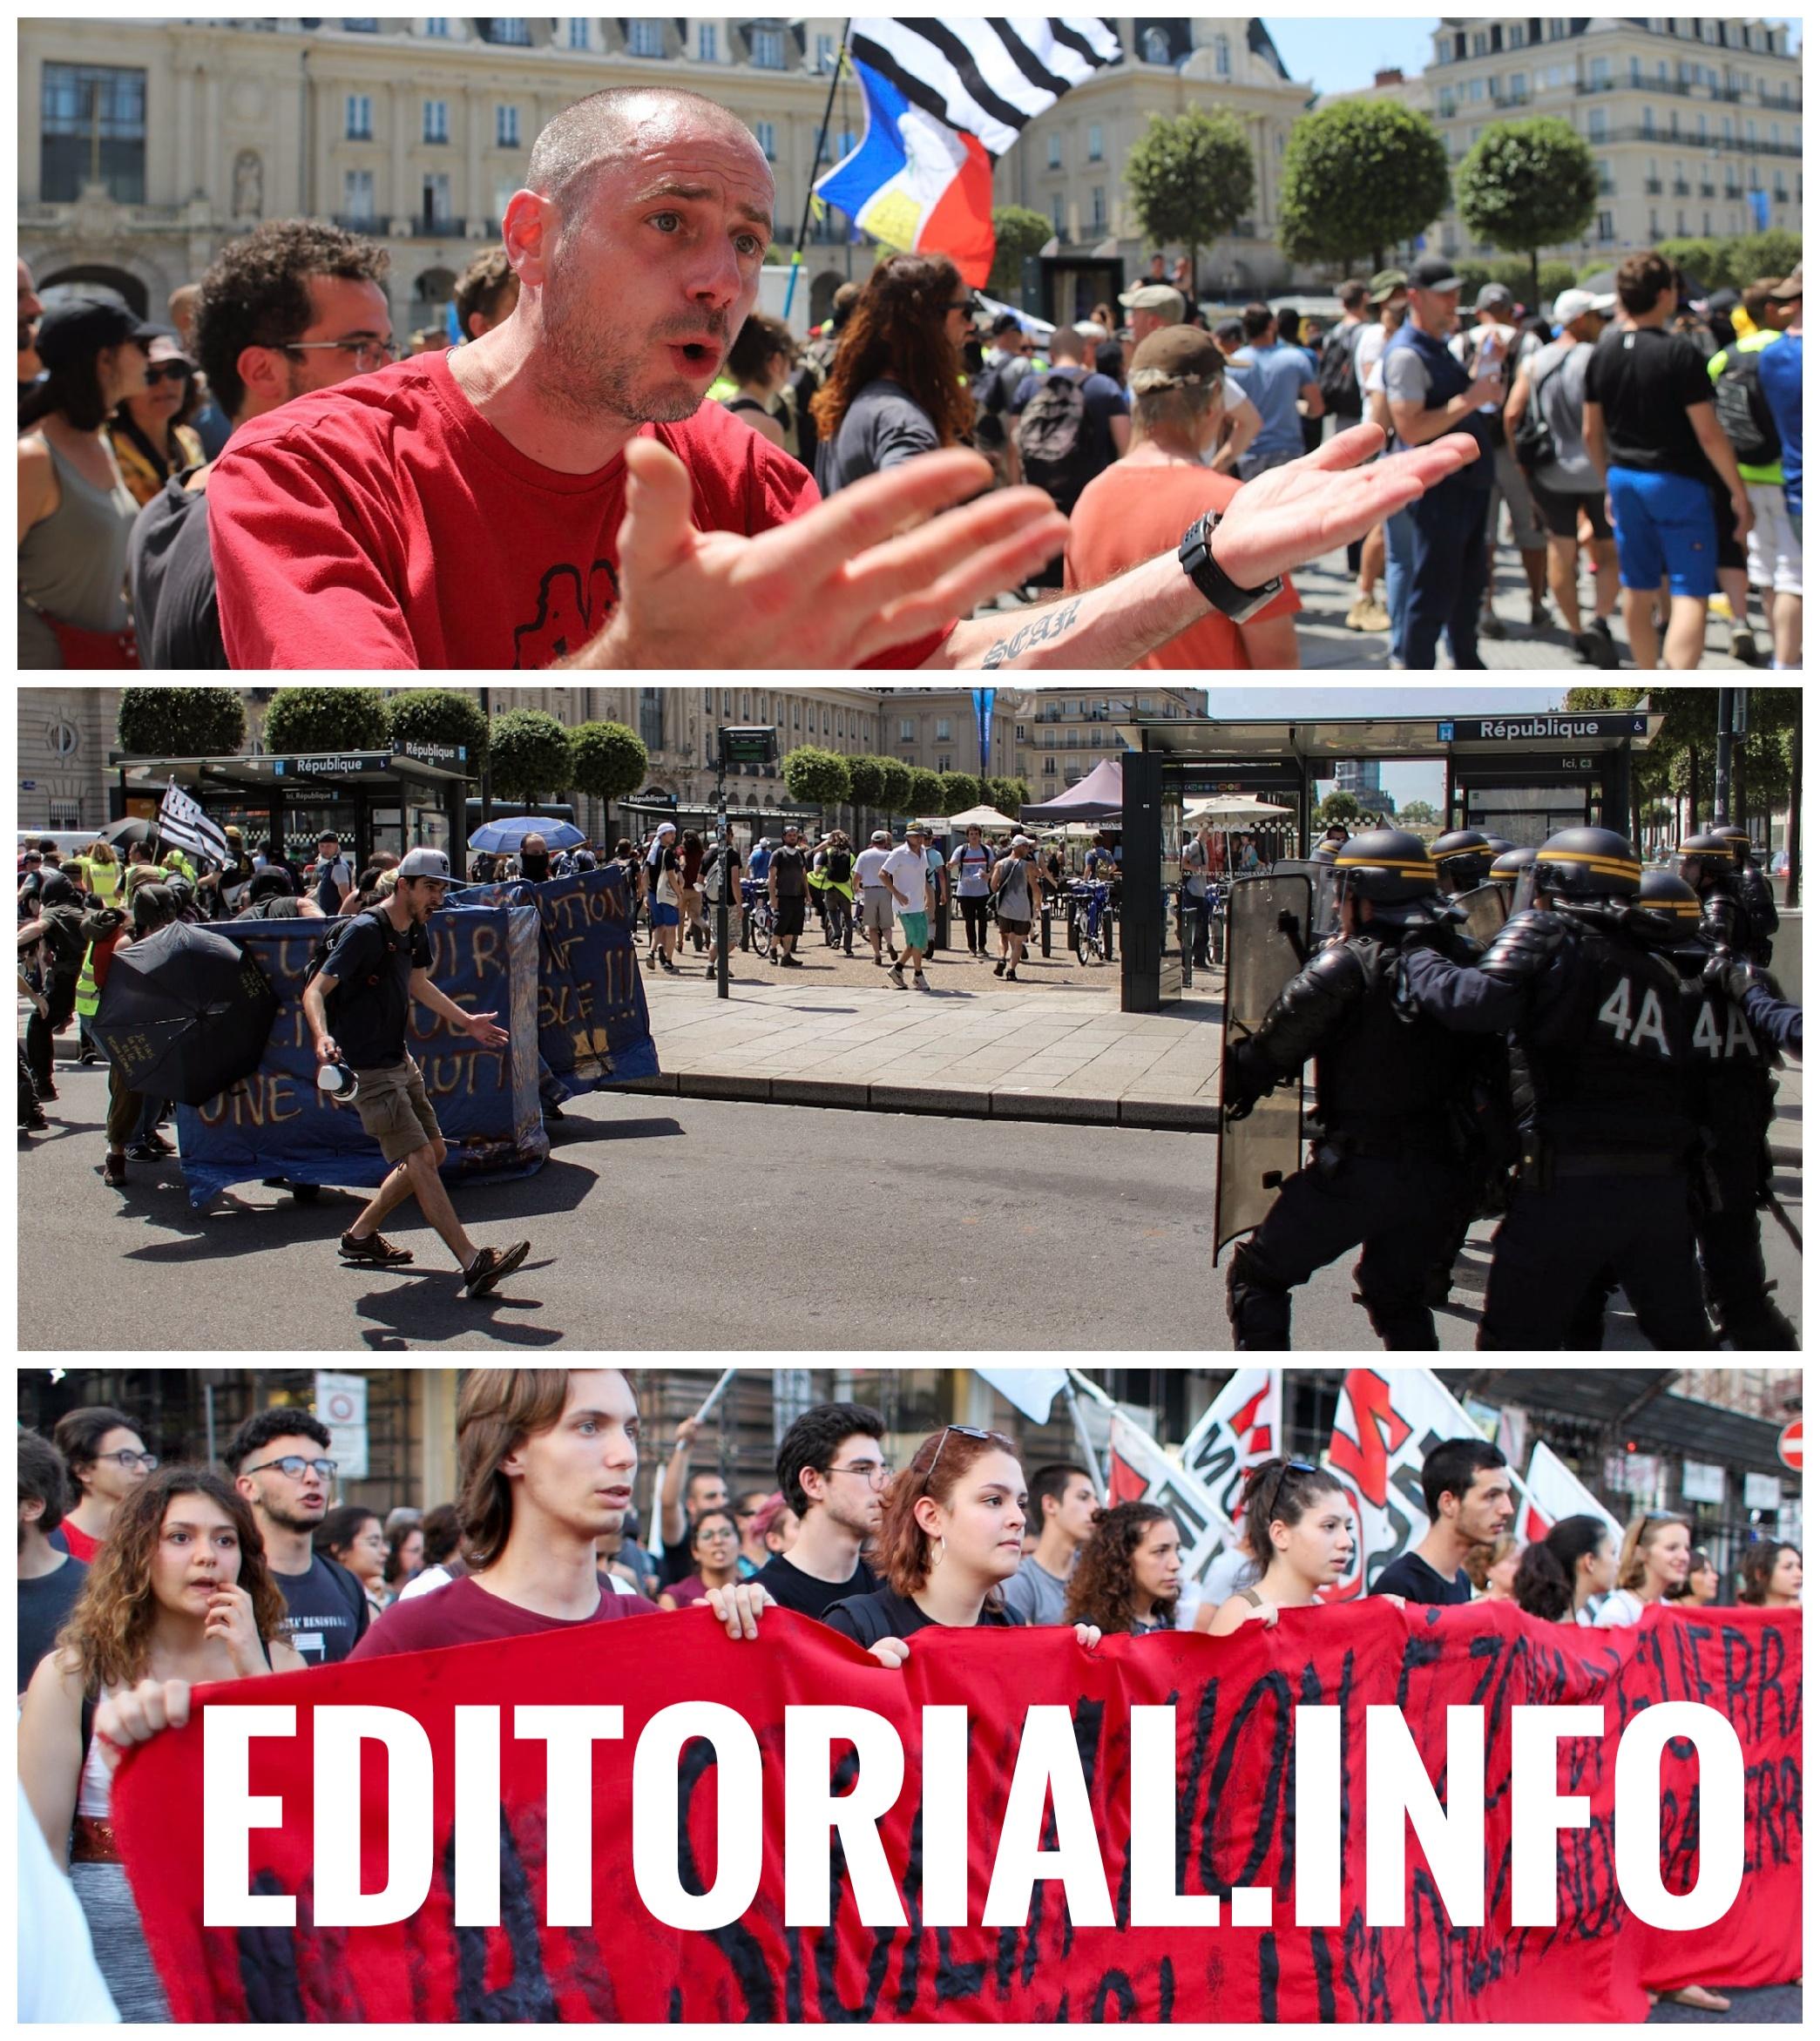 Editorial.info